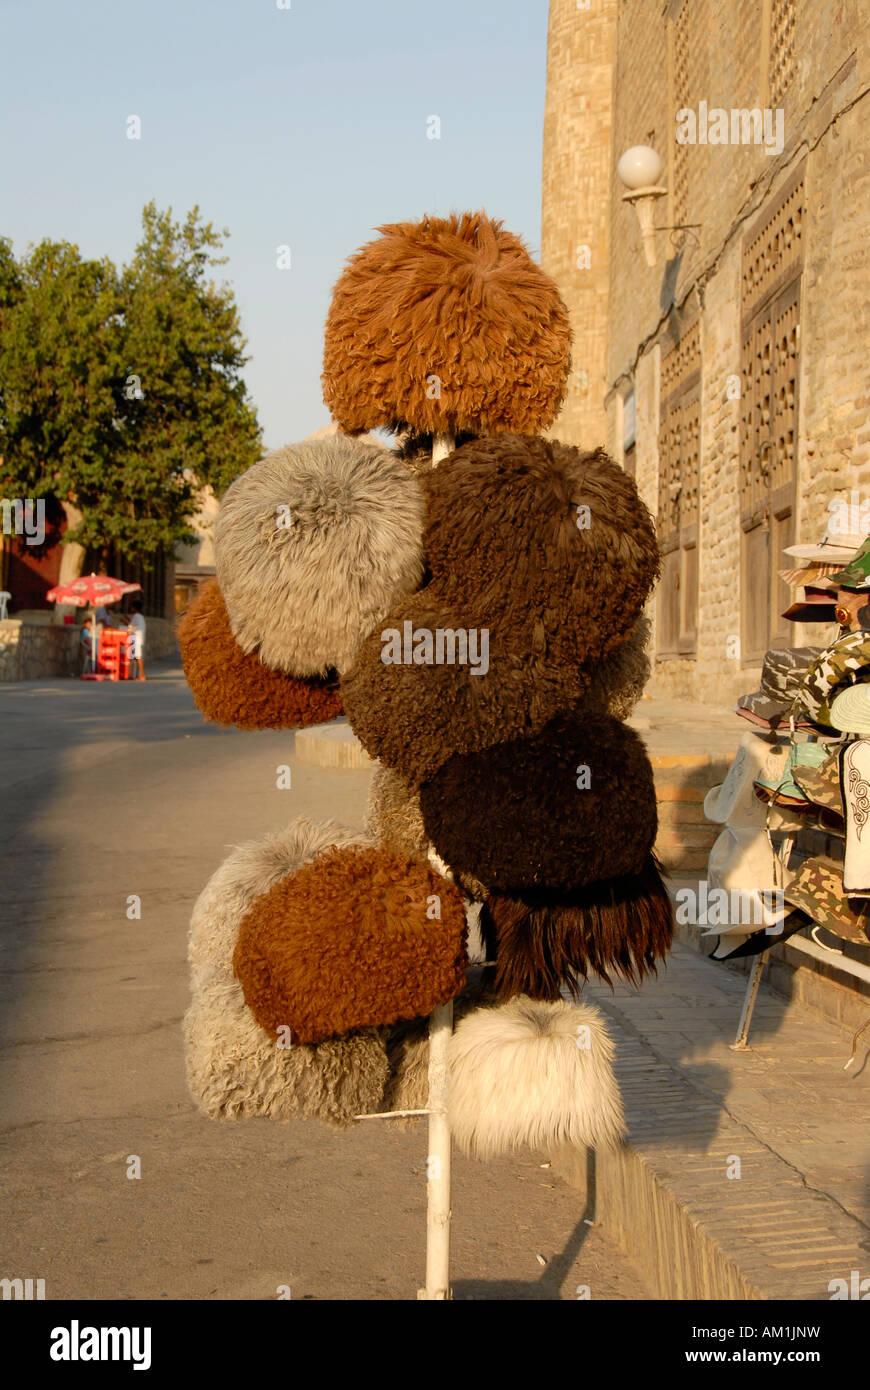 Big hats made of sheep wool from Karakalpakstan displayed for sale in Bukhara Uzbekistan - Stock Image